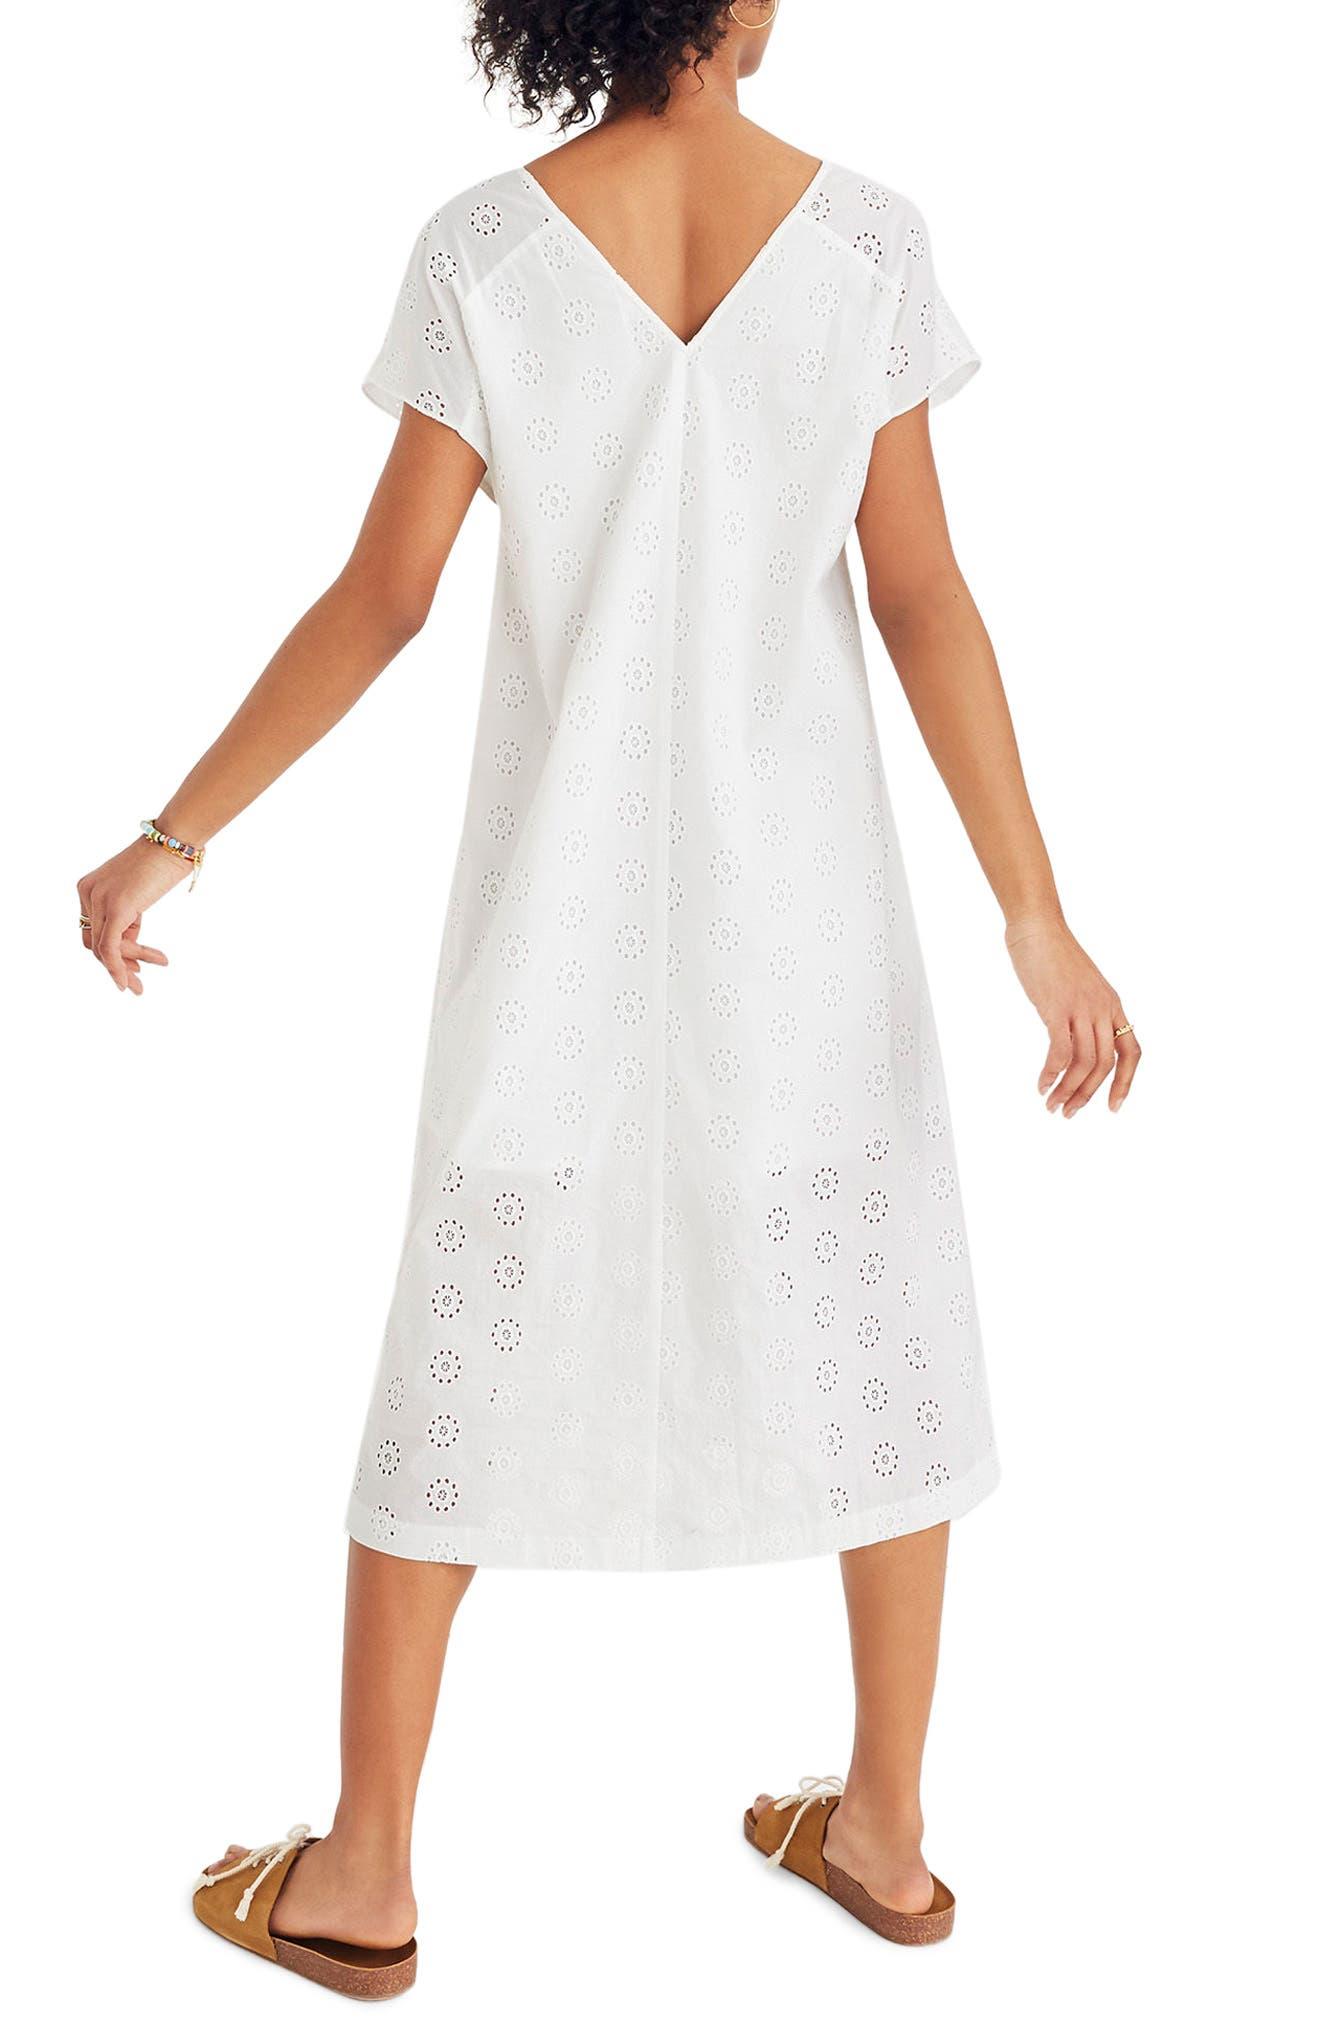 Eyelet Midi Dress,                             Alternate thumbnail 2, color,                             Eyelet White